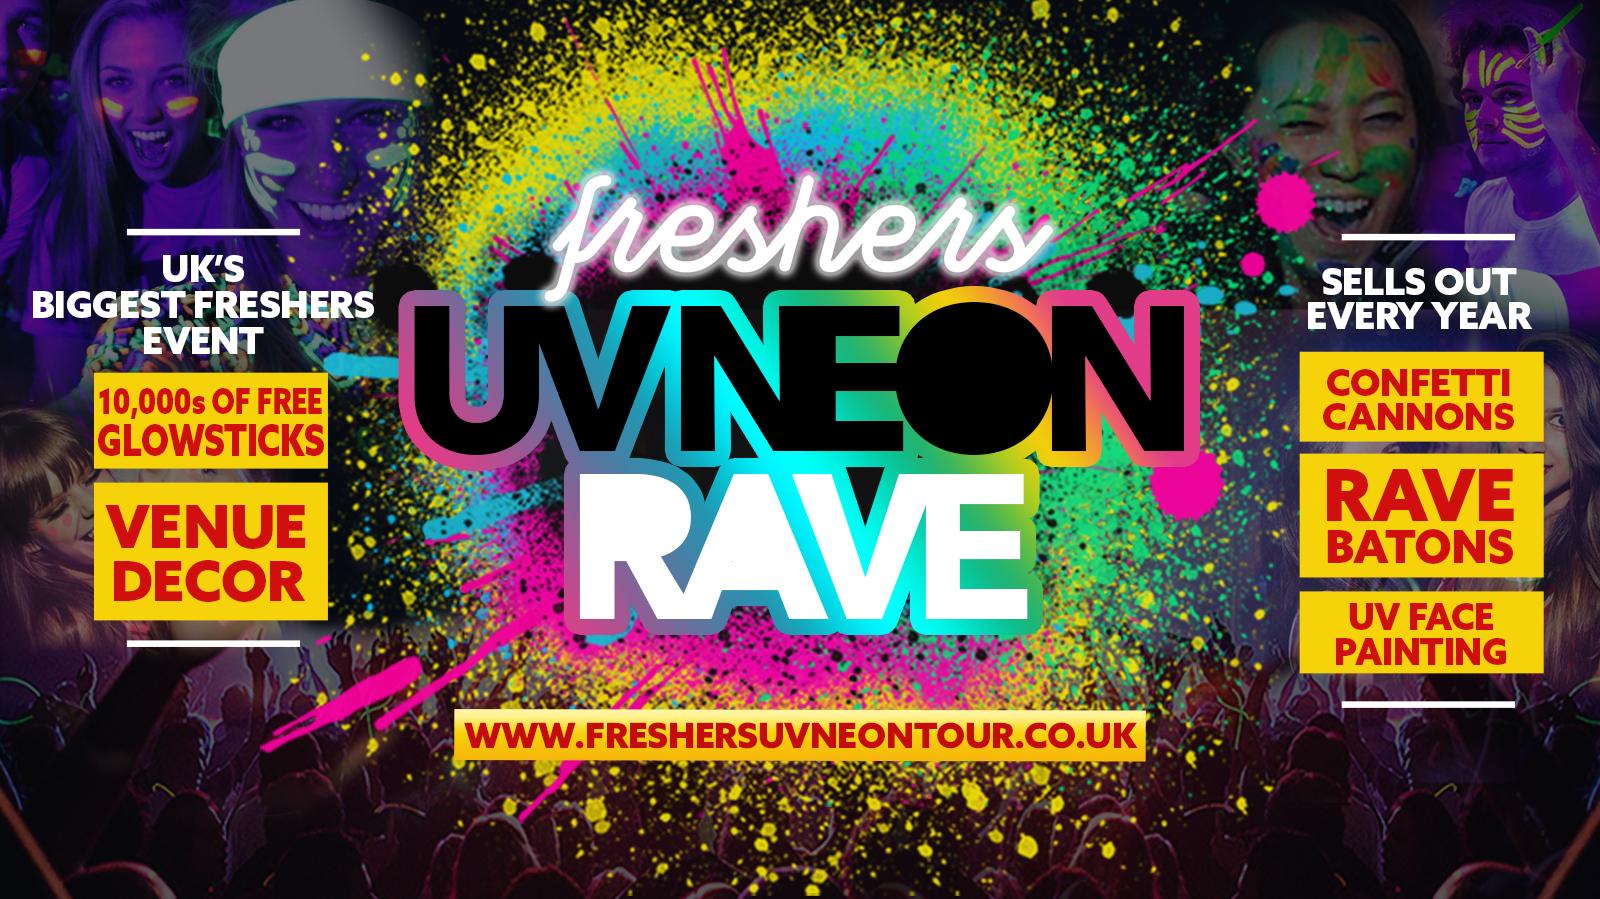 Bournemouth Freshers UV Neon Rave   Bournemouth Freshers 2021